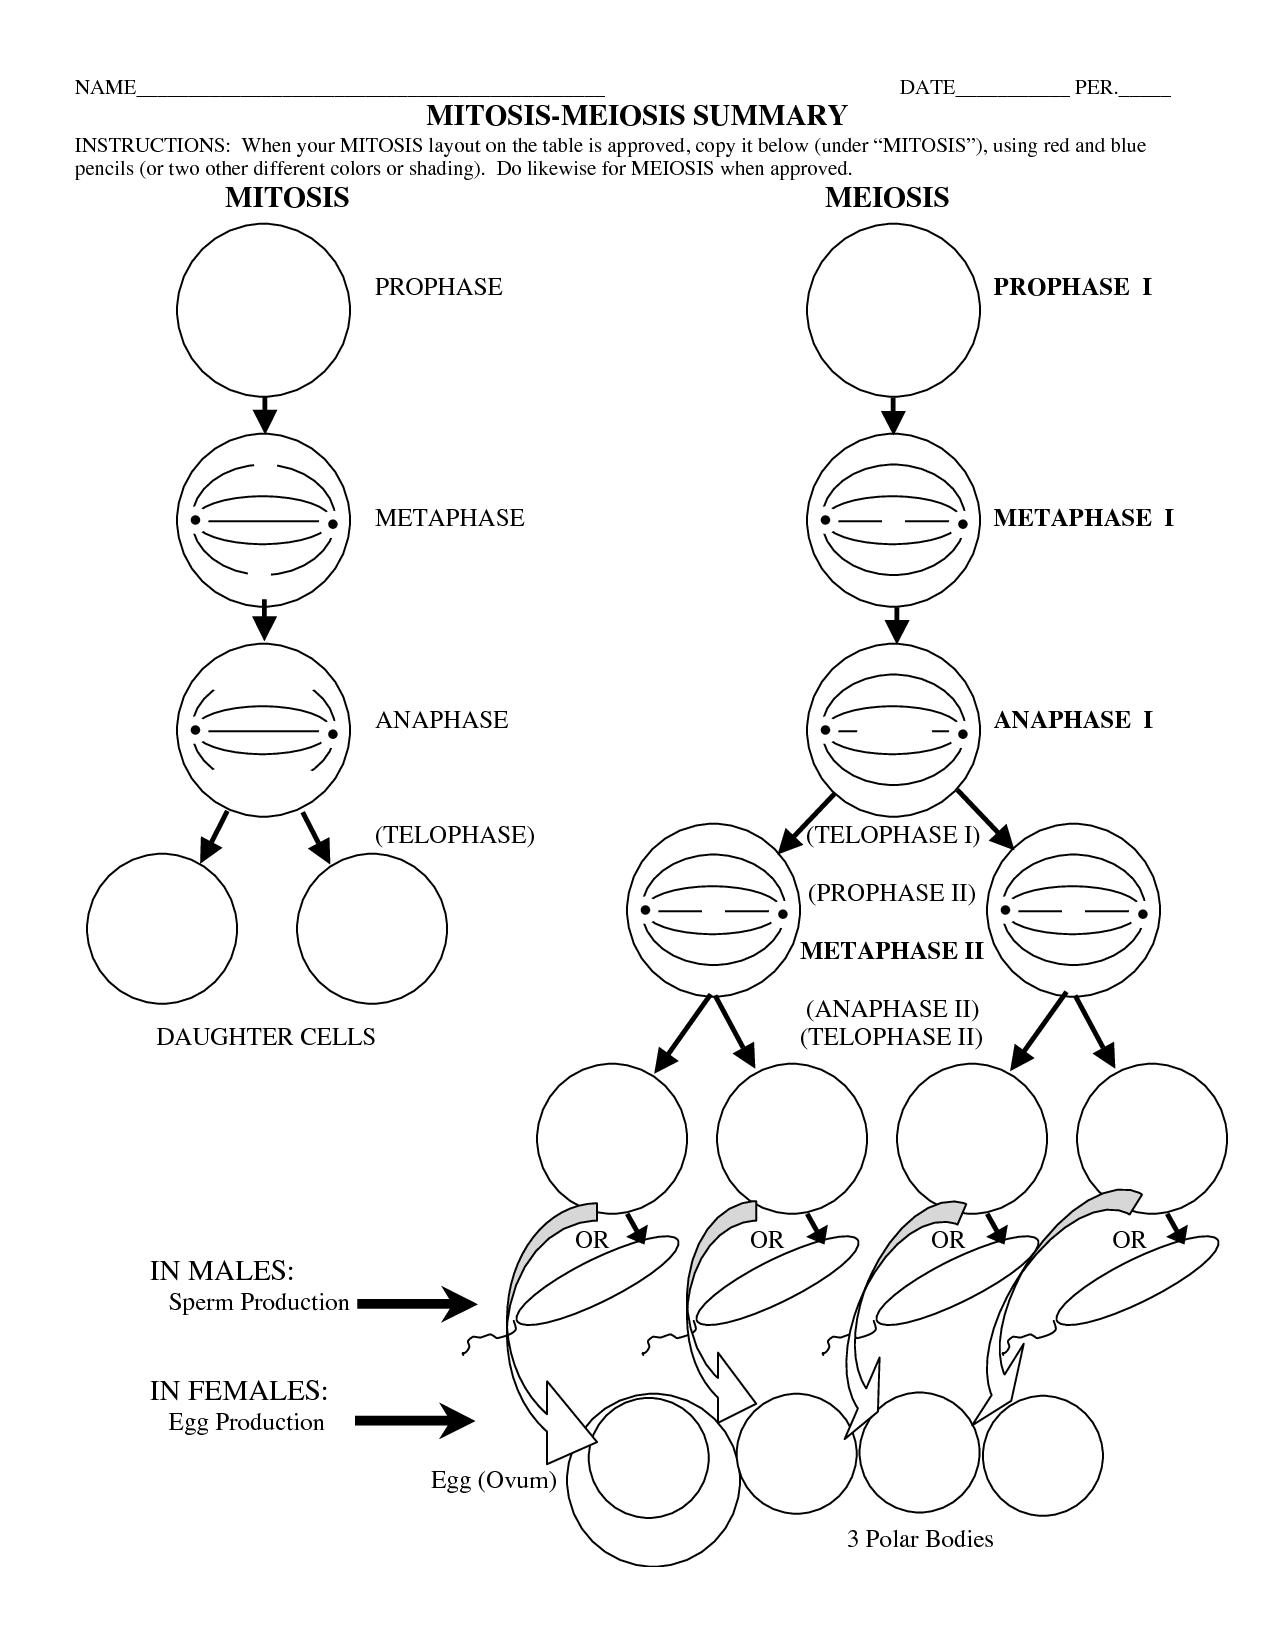 Mitosis Vs Meiosis Worksheet Com And